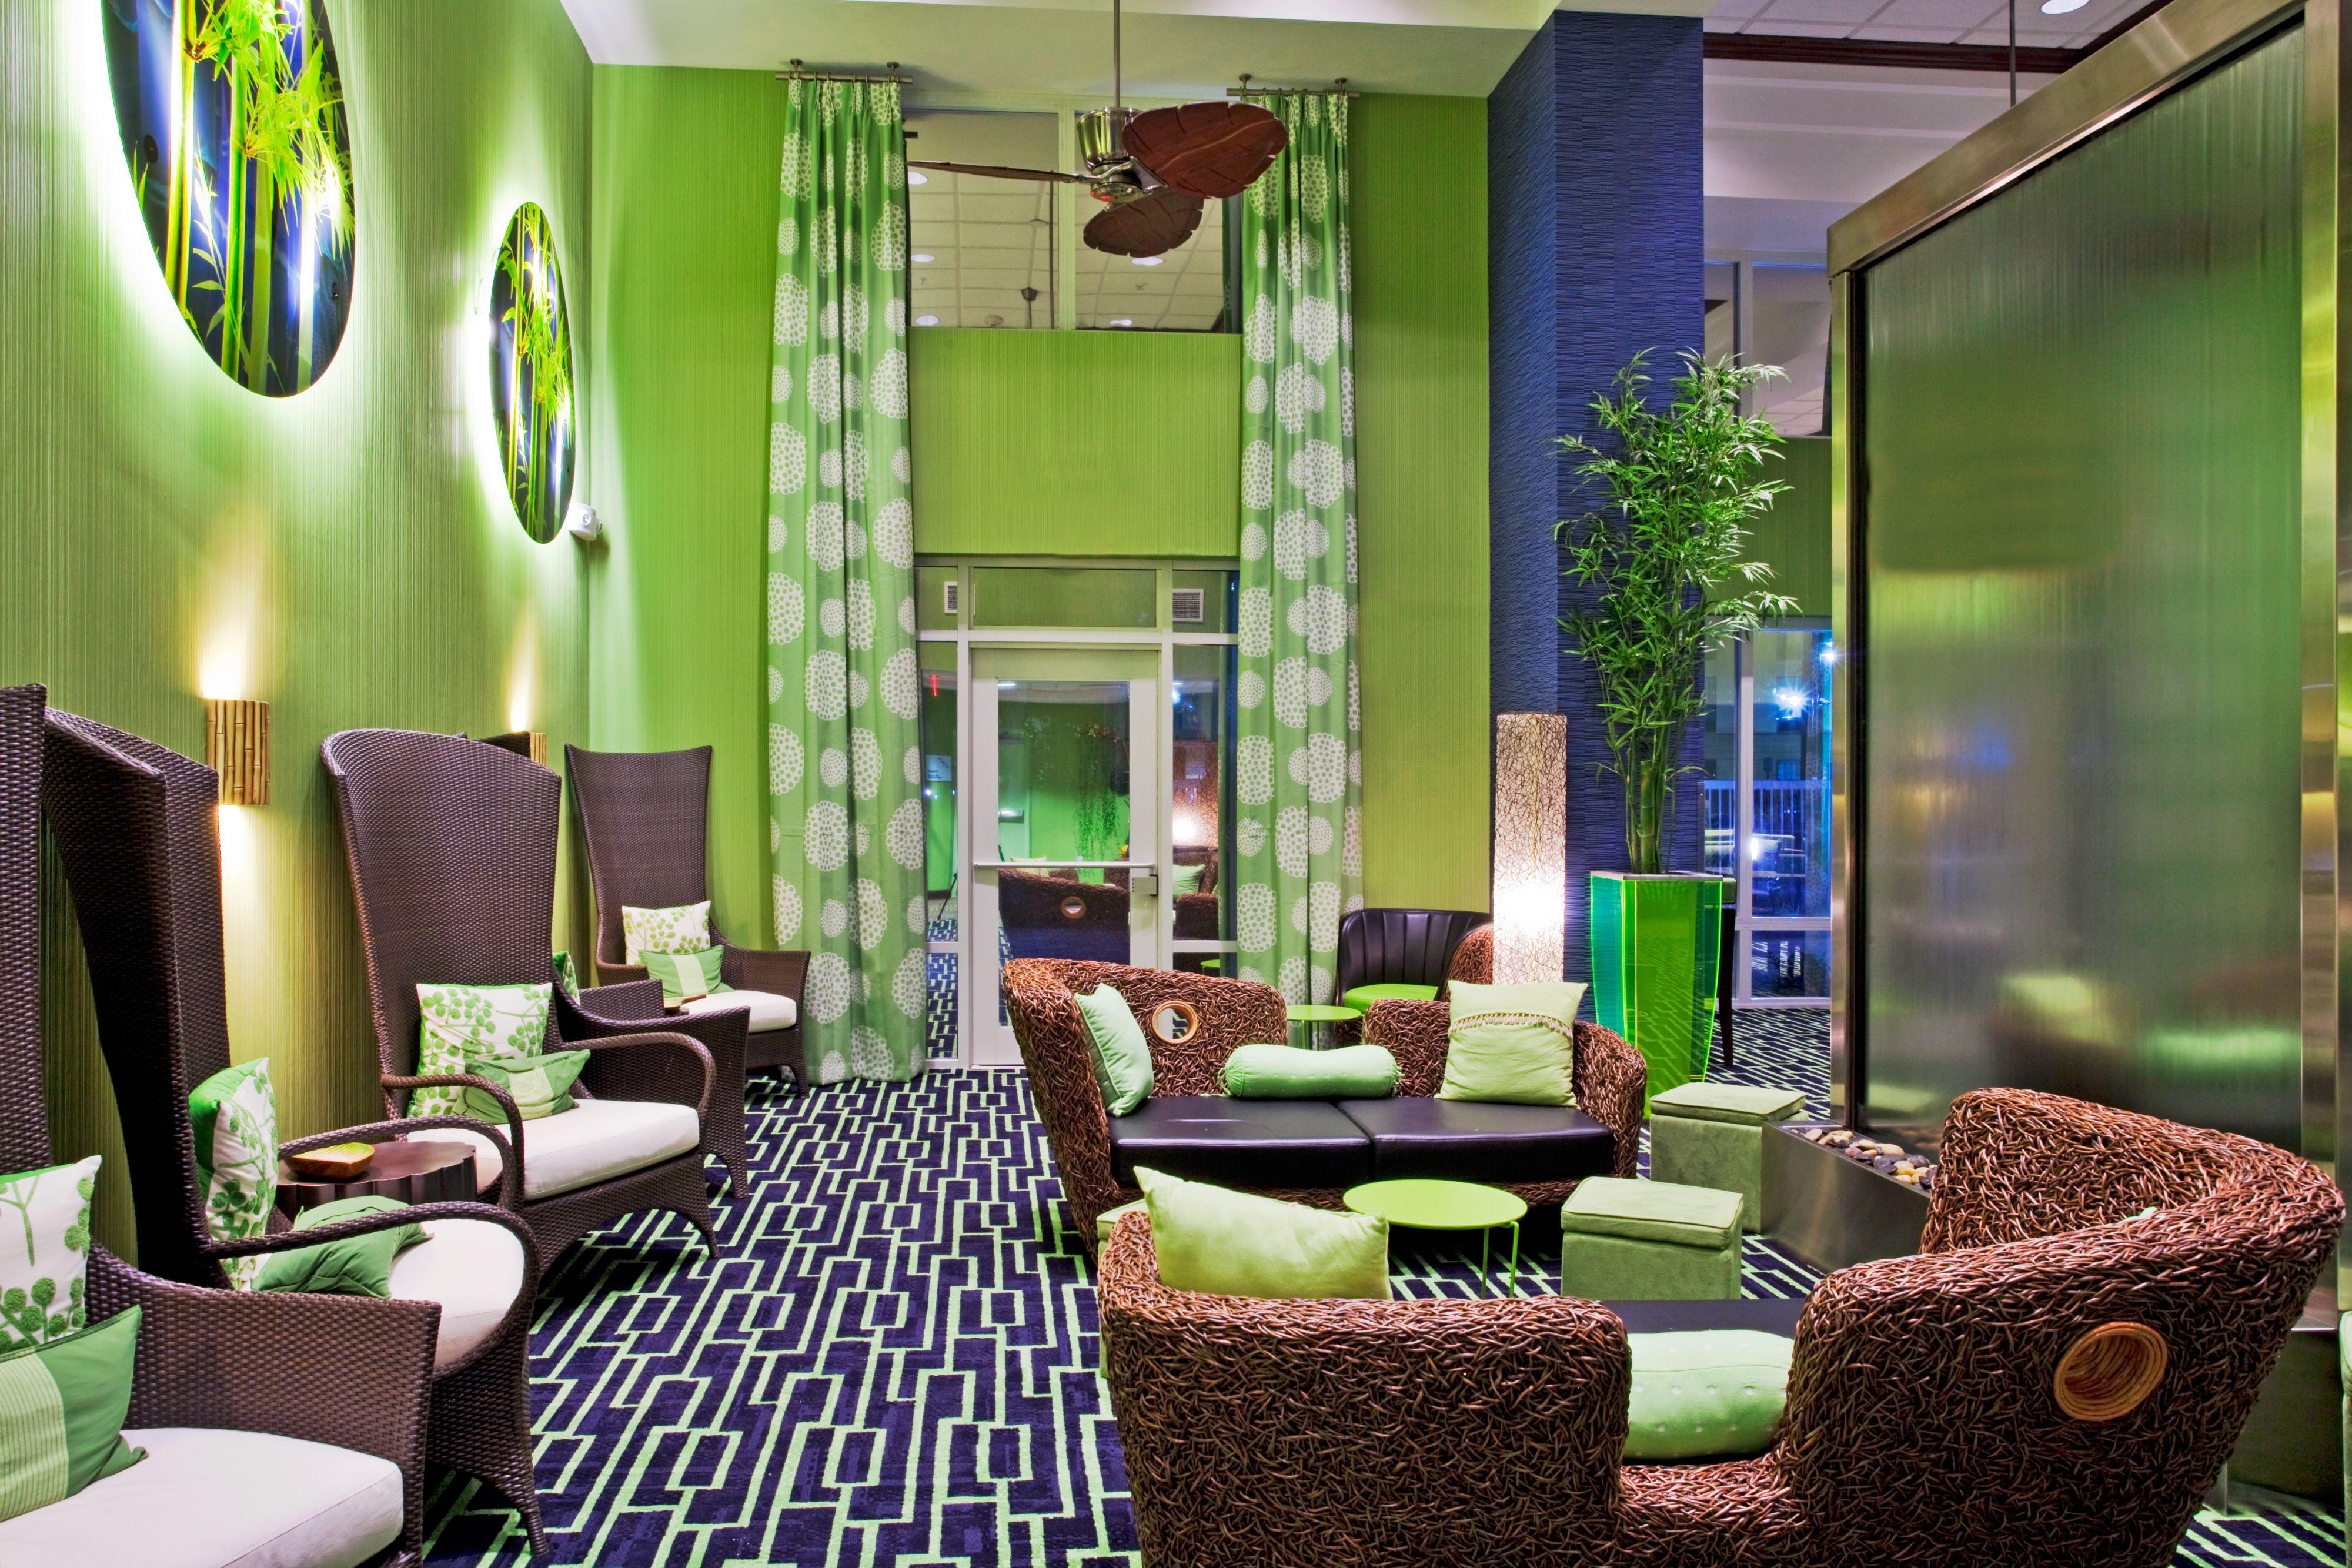 Holiday Inn Express & Suites Orlando - Apopka image 6